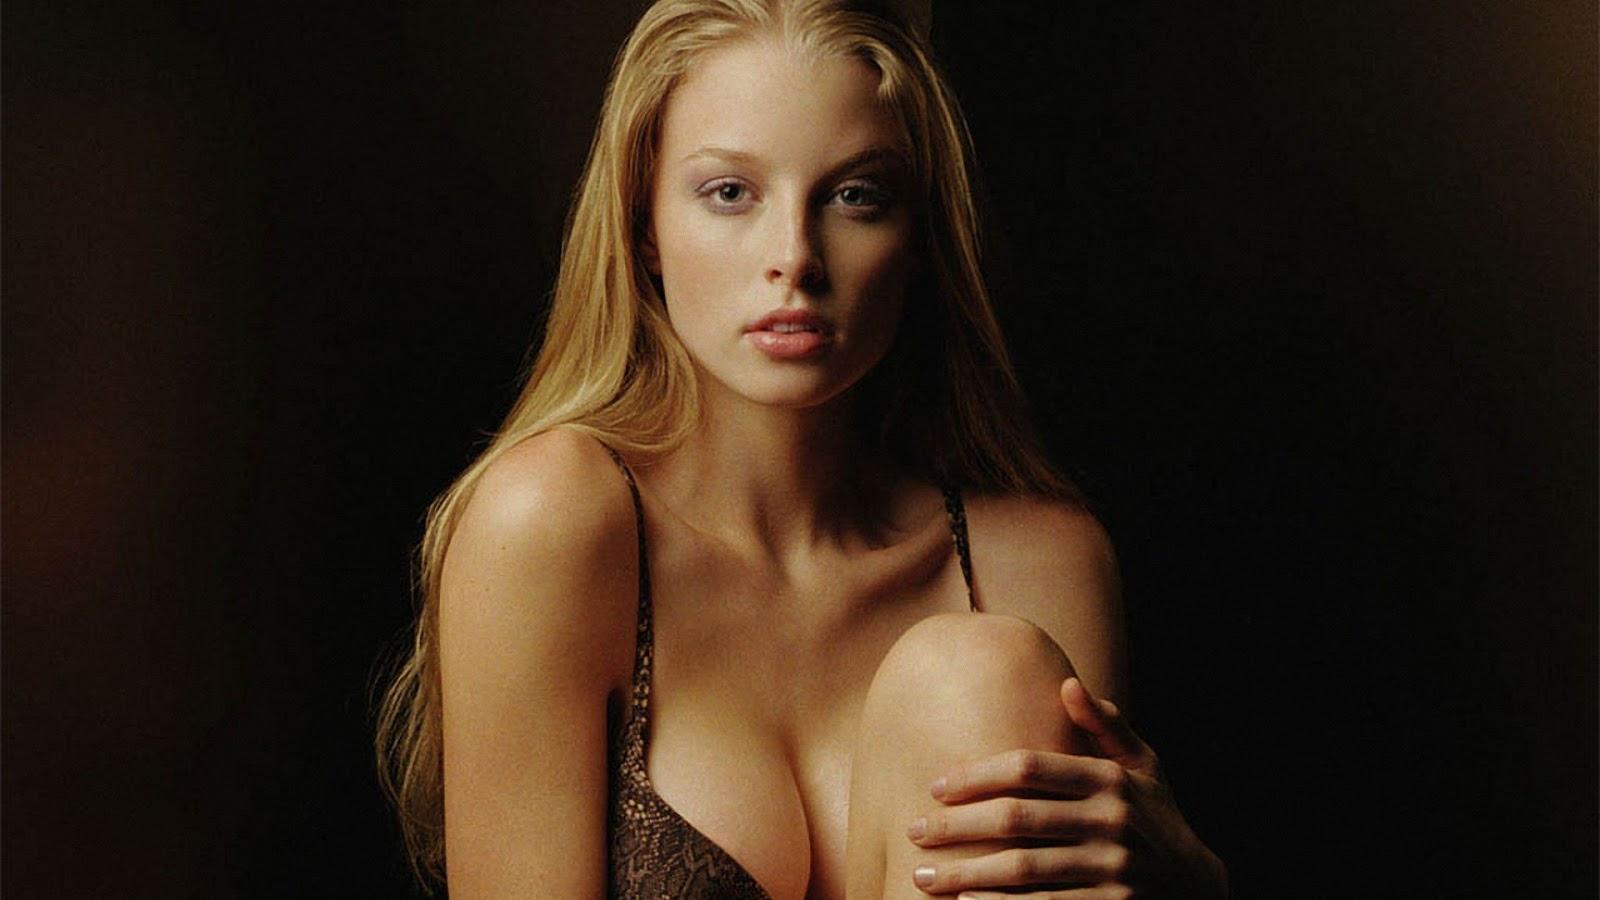 Rachel Nichols Sexy Pictures